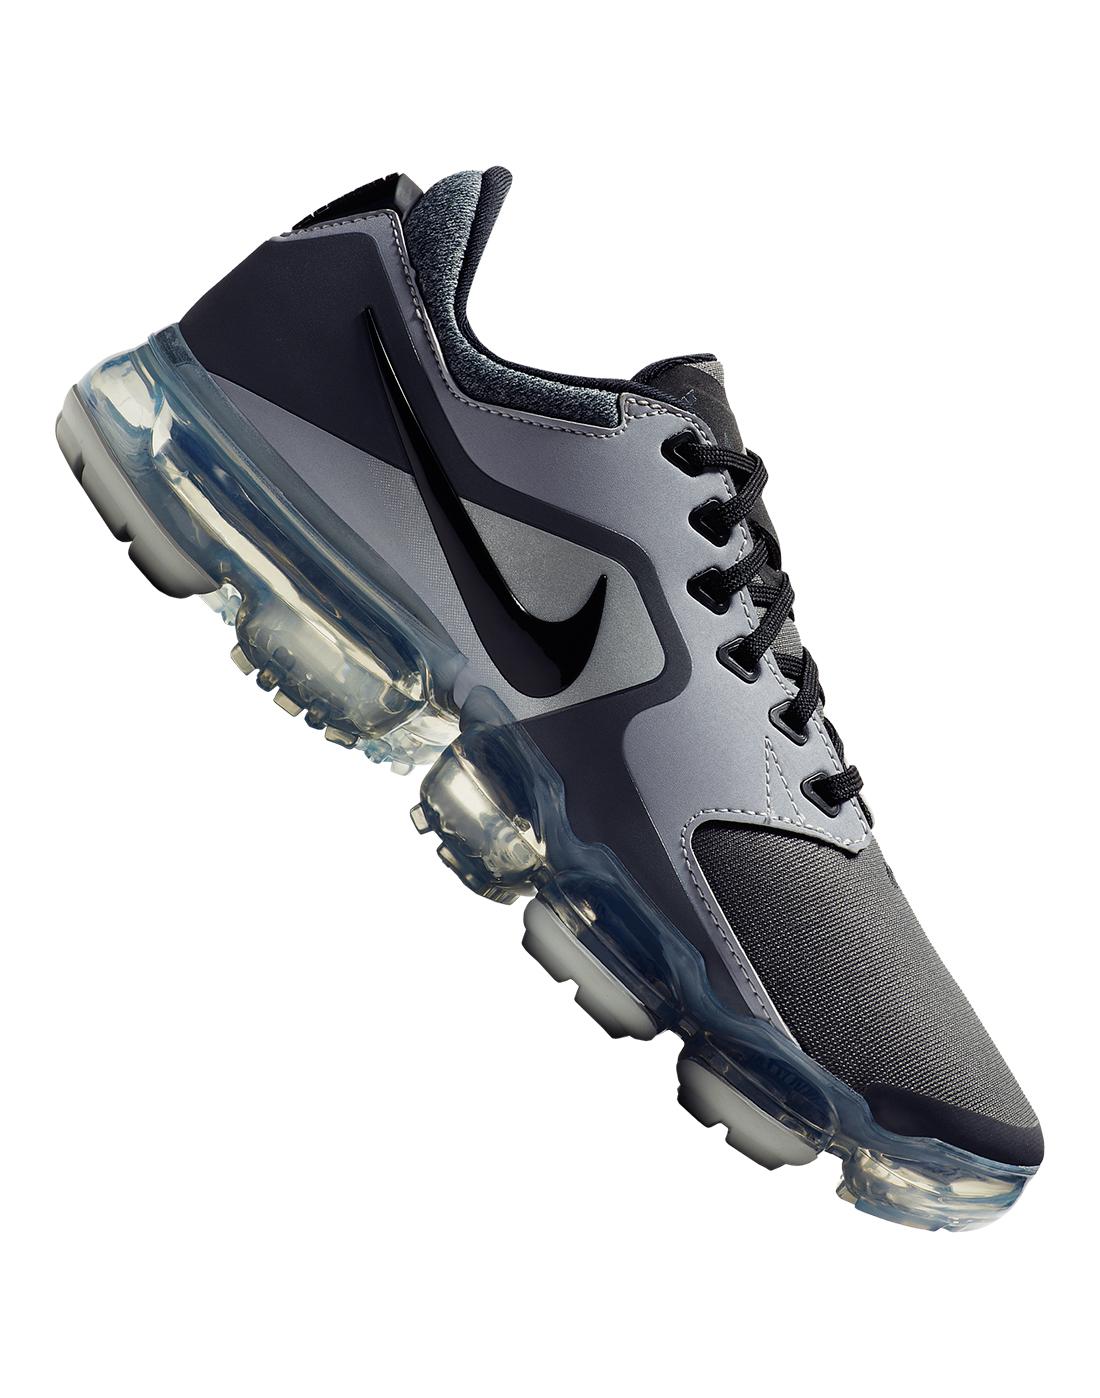 3f698f07fe18 Kid s Grey Nike Air VaporMax Trainers